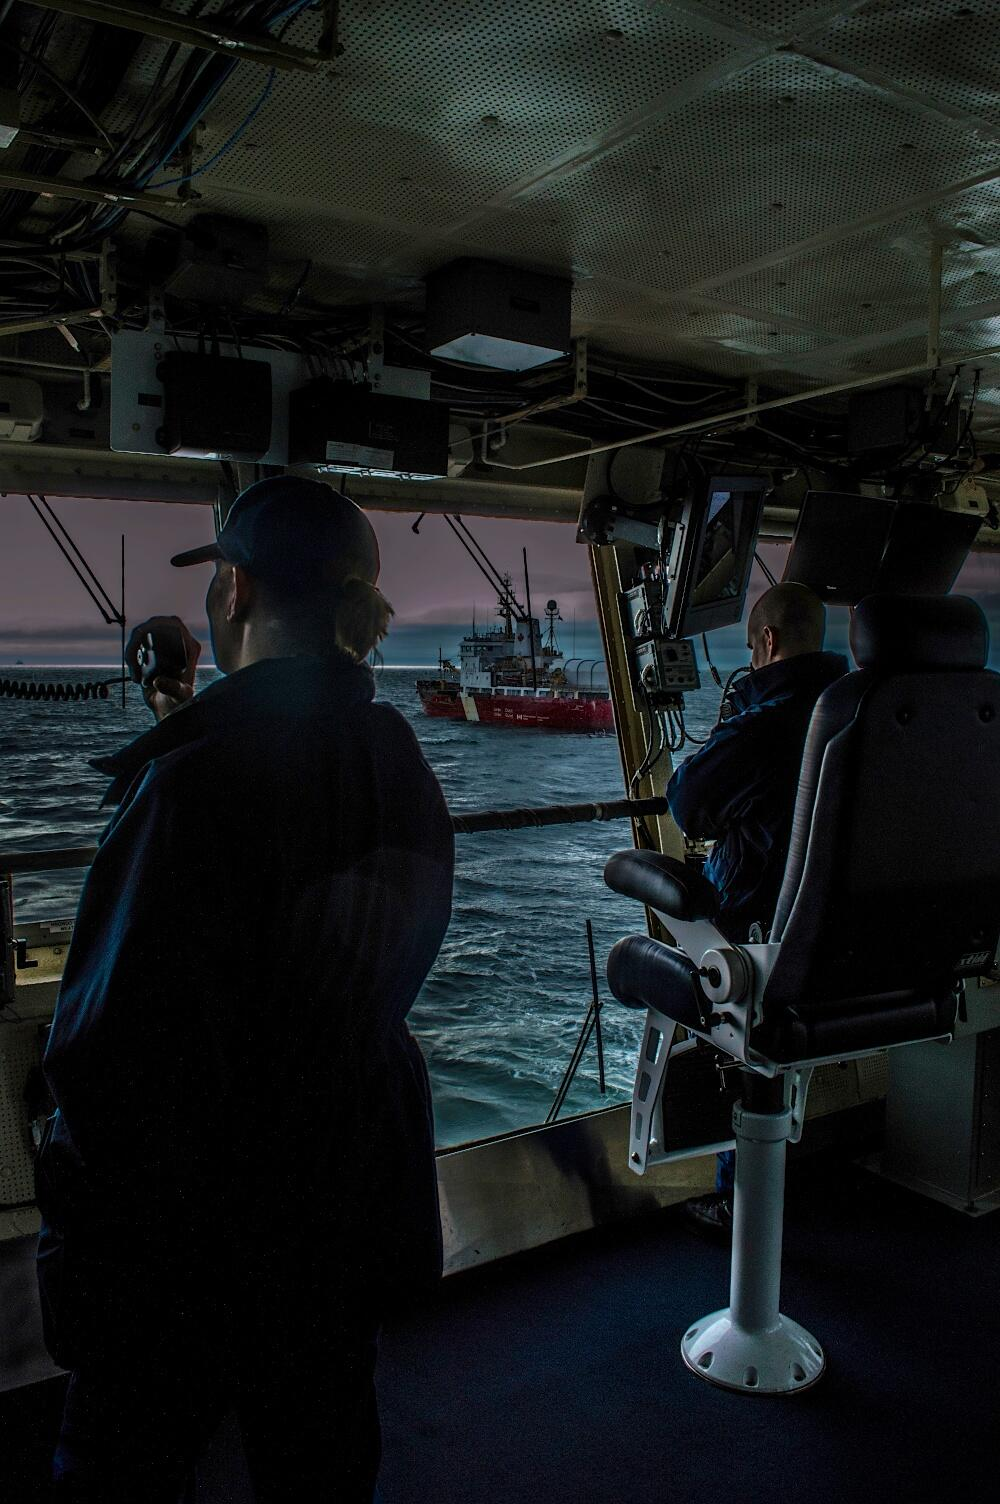 RT @USCGAlaska: CGC SPAR approaches the  @CCG_GCC ship Sir Wilfred Laurier during a towing exercise July 17 near Teller, AK. #AS2013 http://t.co/9yxEpMubun